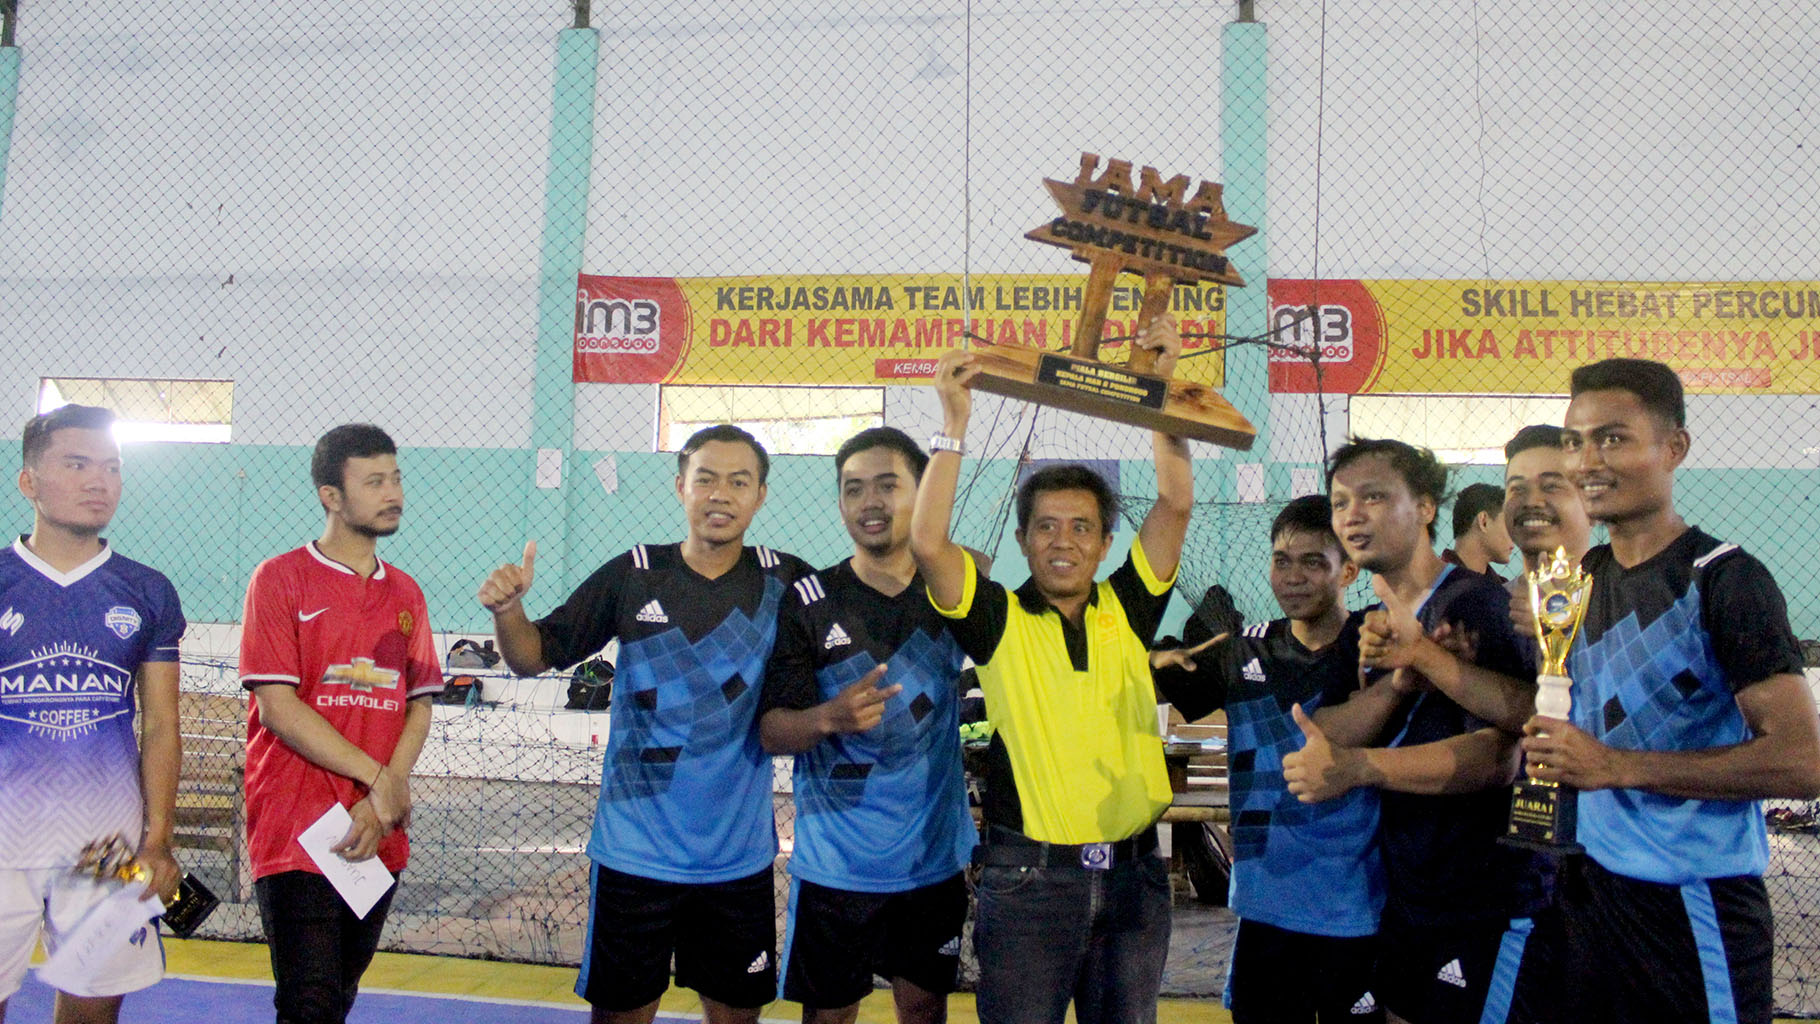 IAMA Futsal Cup 2017 MAN 2 Ponorogo